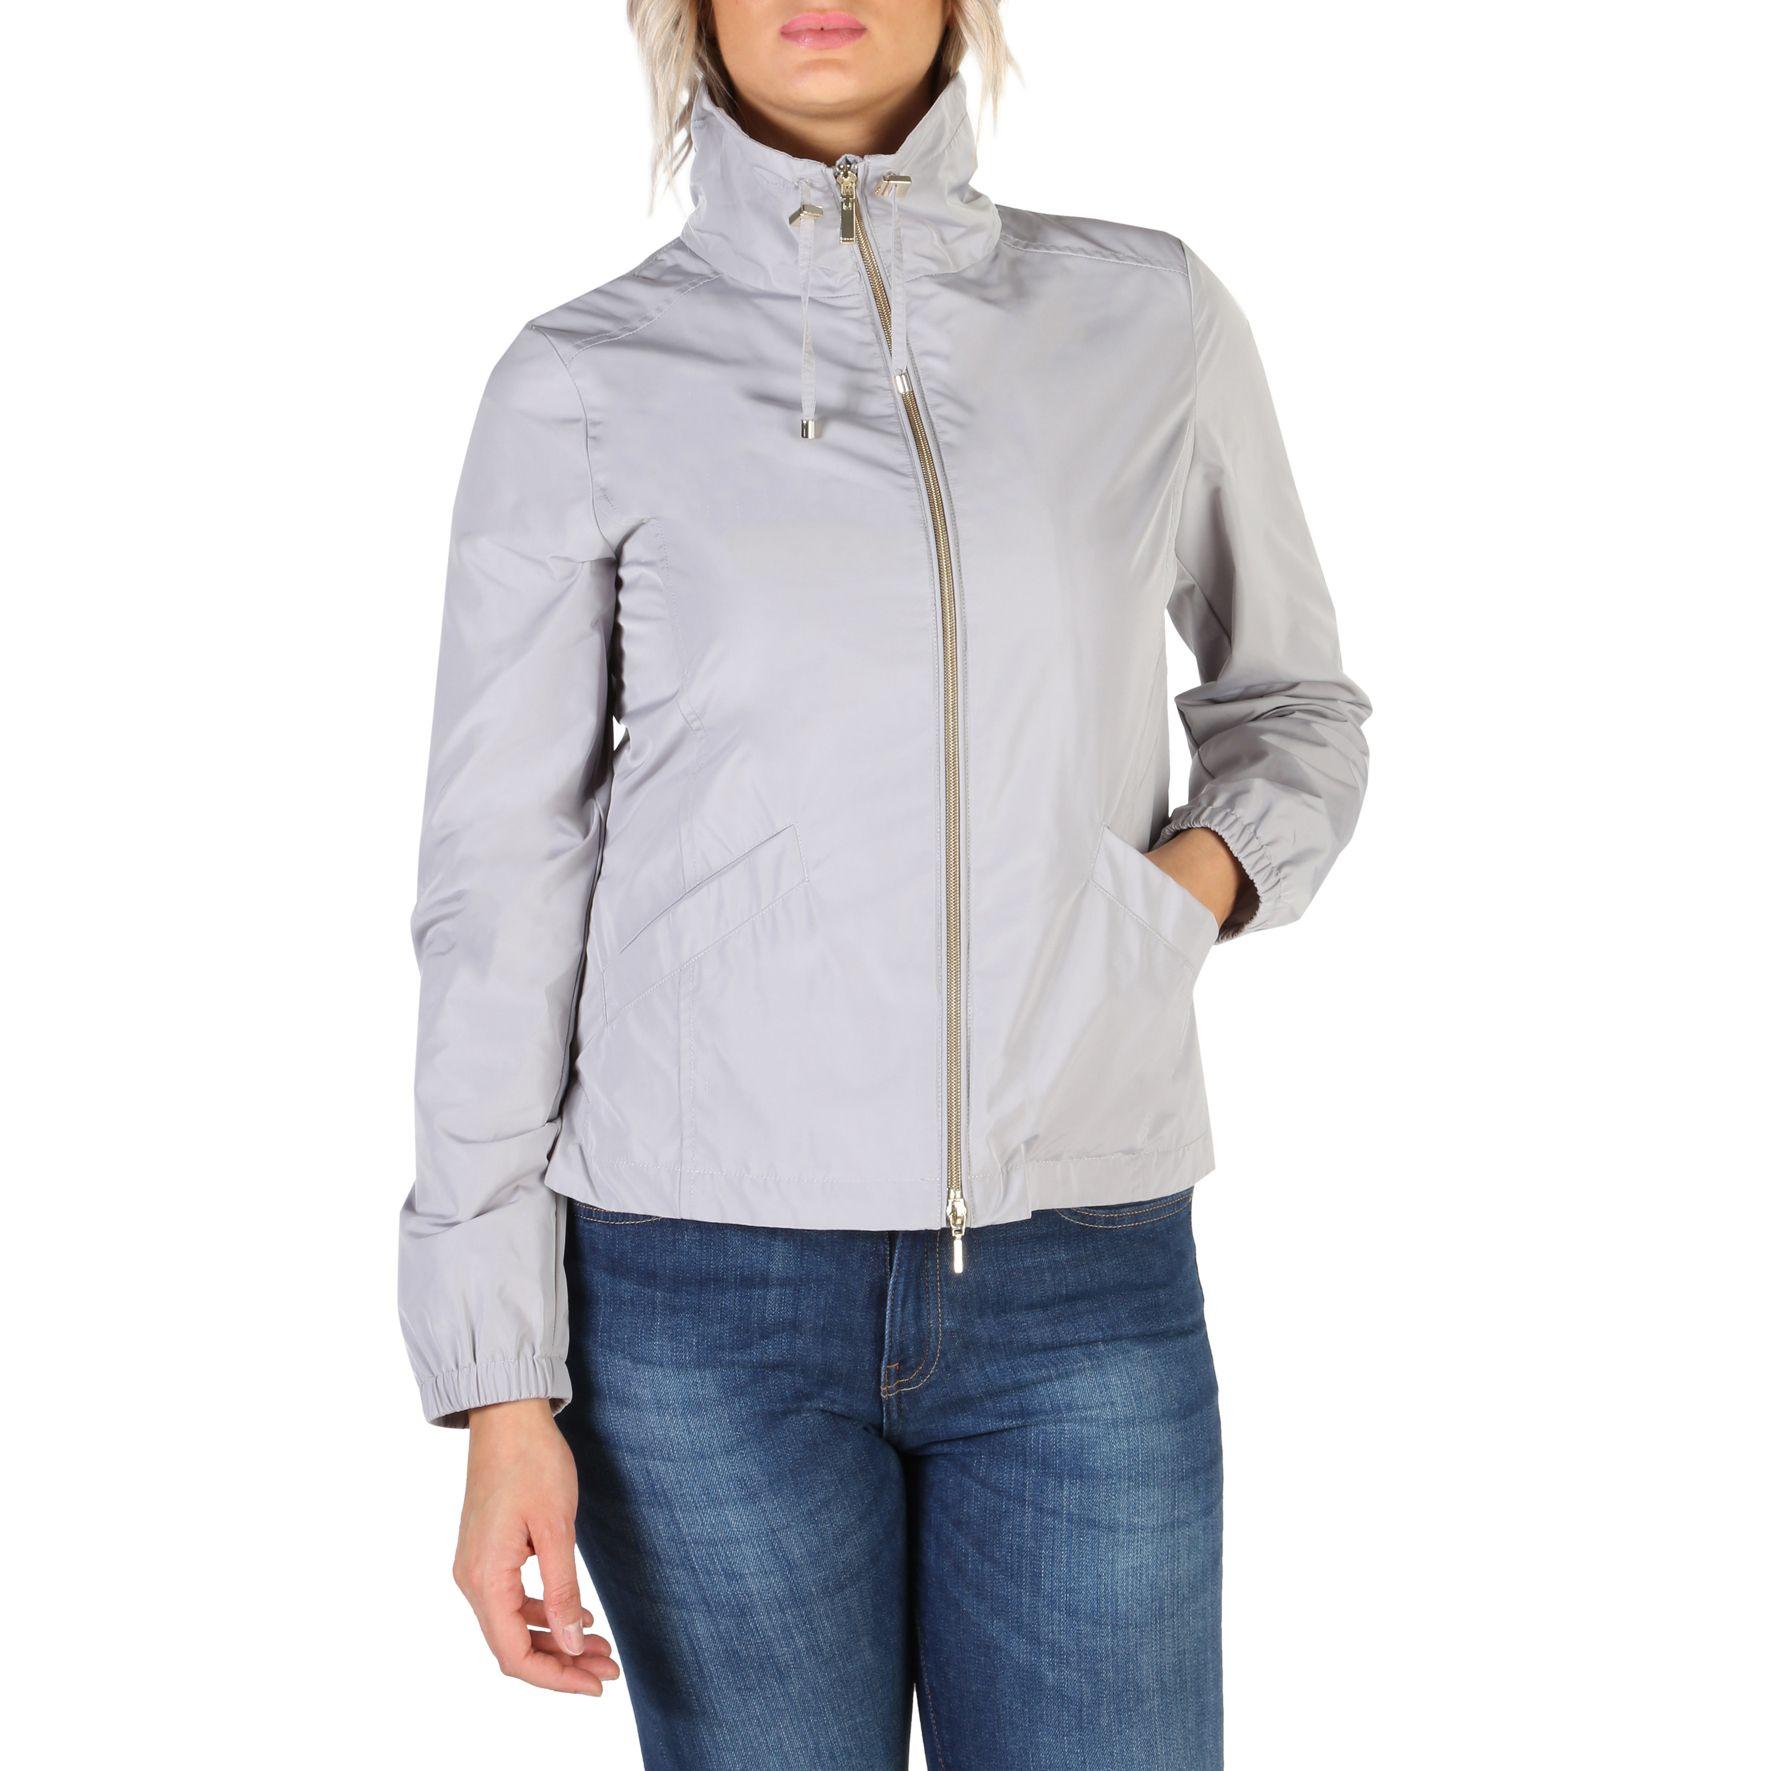 Geox Womens Jackets